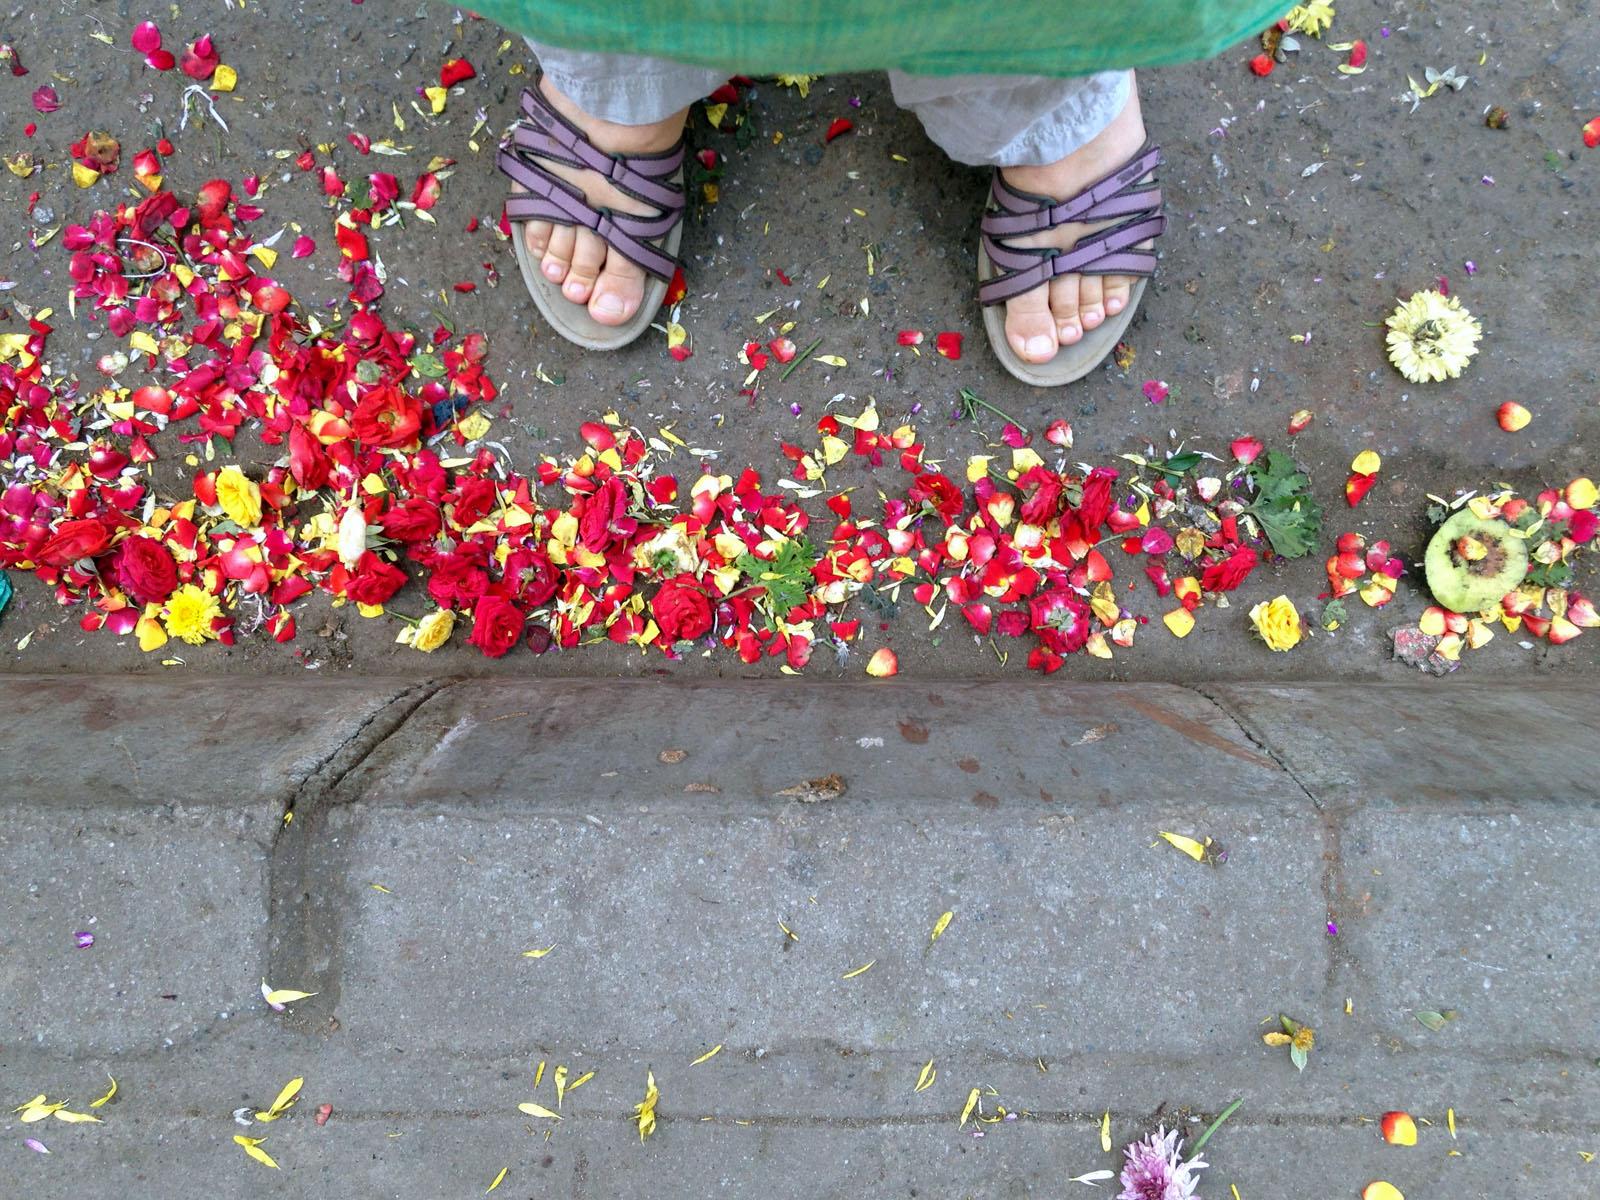 flowers-at-my-feet.jpg